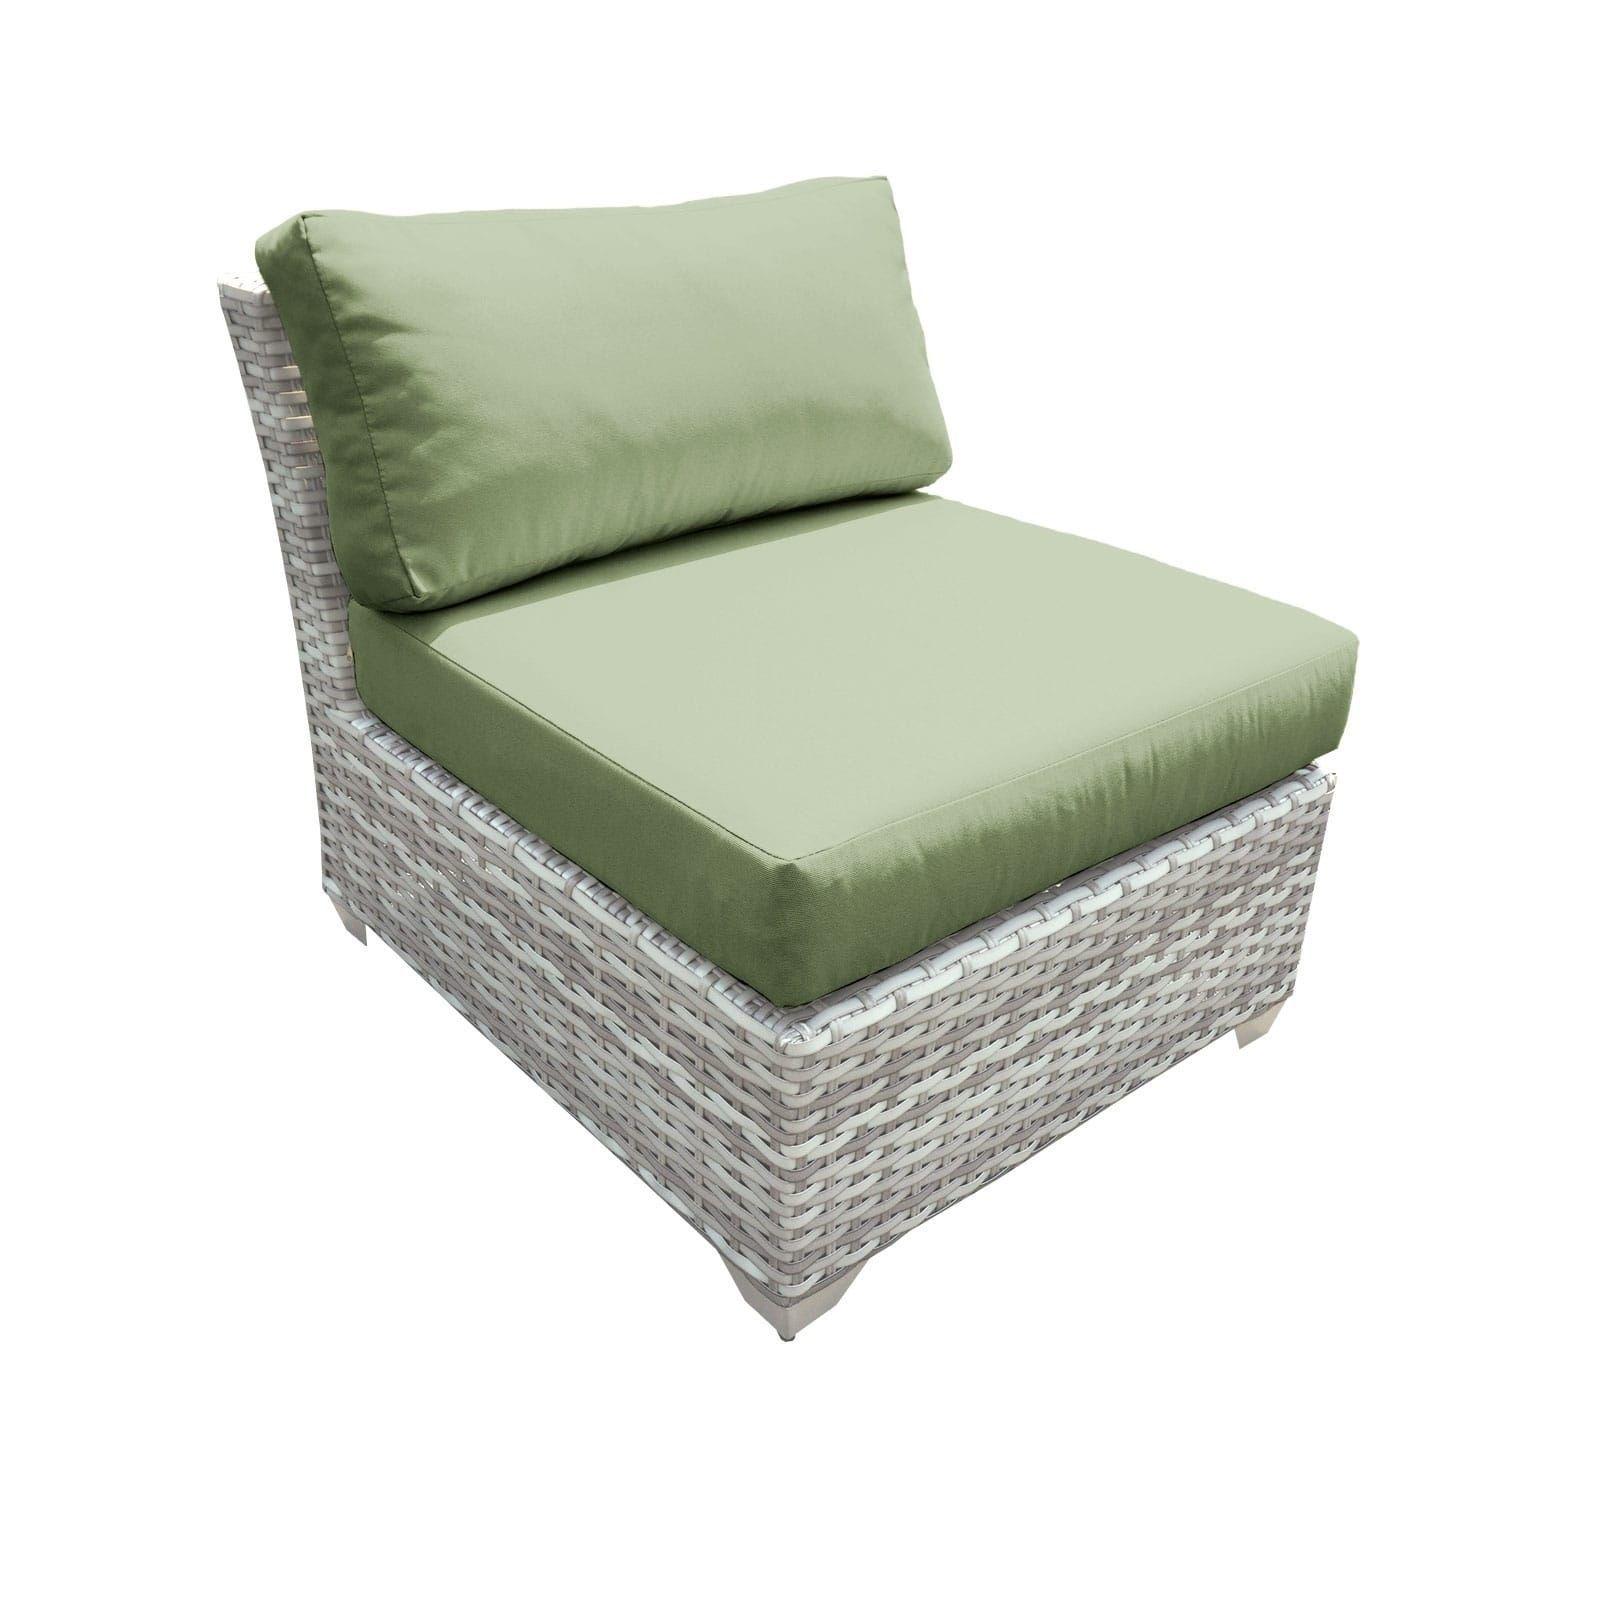 Catamaran Outdoor Patio Armless Wicker Sofa Segment (Set of 2) (Green), Size 2-Piece Sets, Patio Furniture (Acrylic)